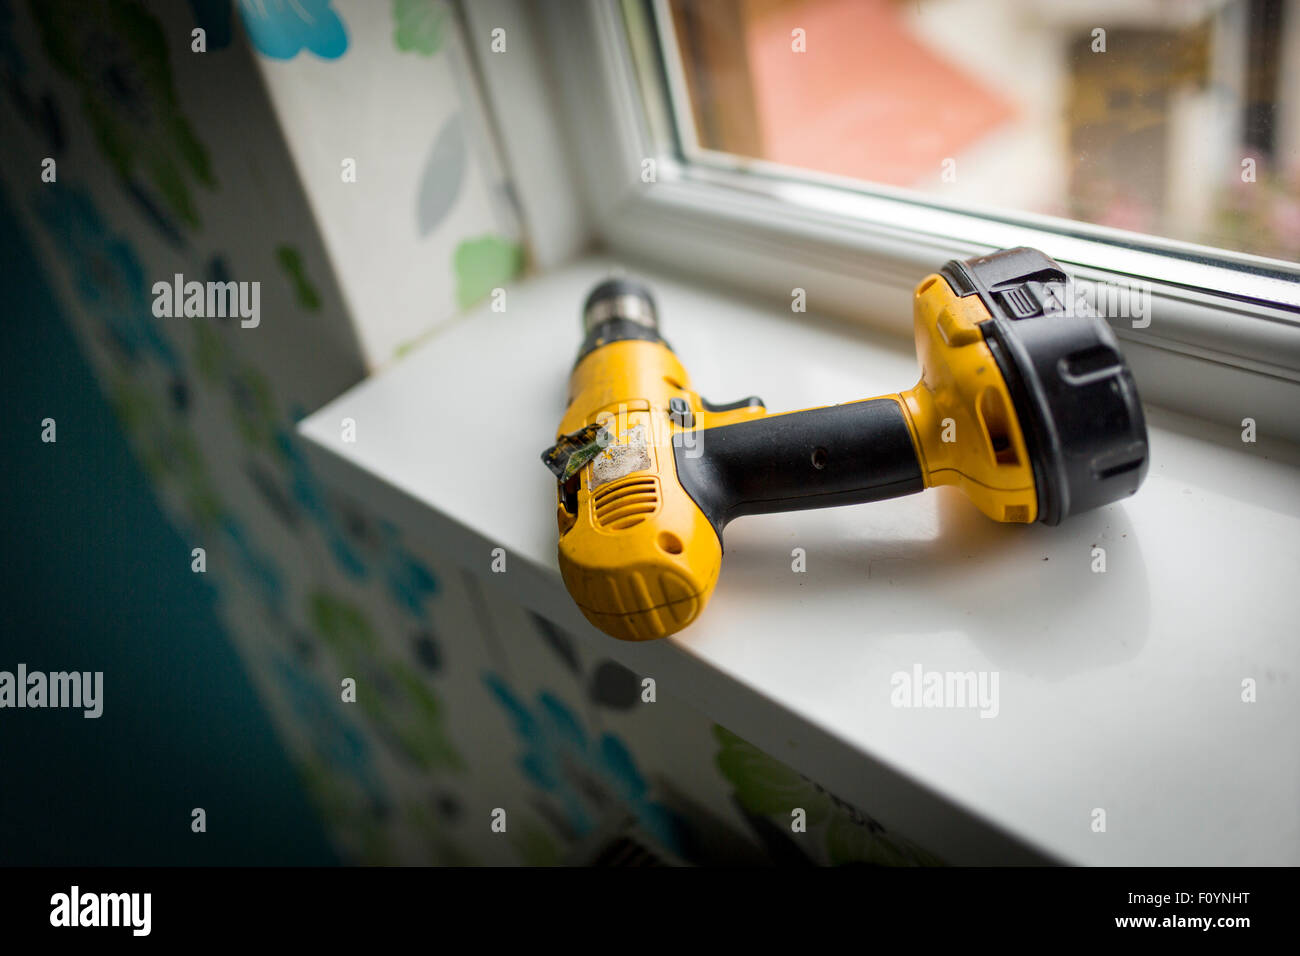 a power drill on a windowsill - Stock Image